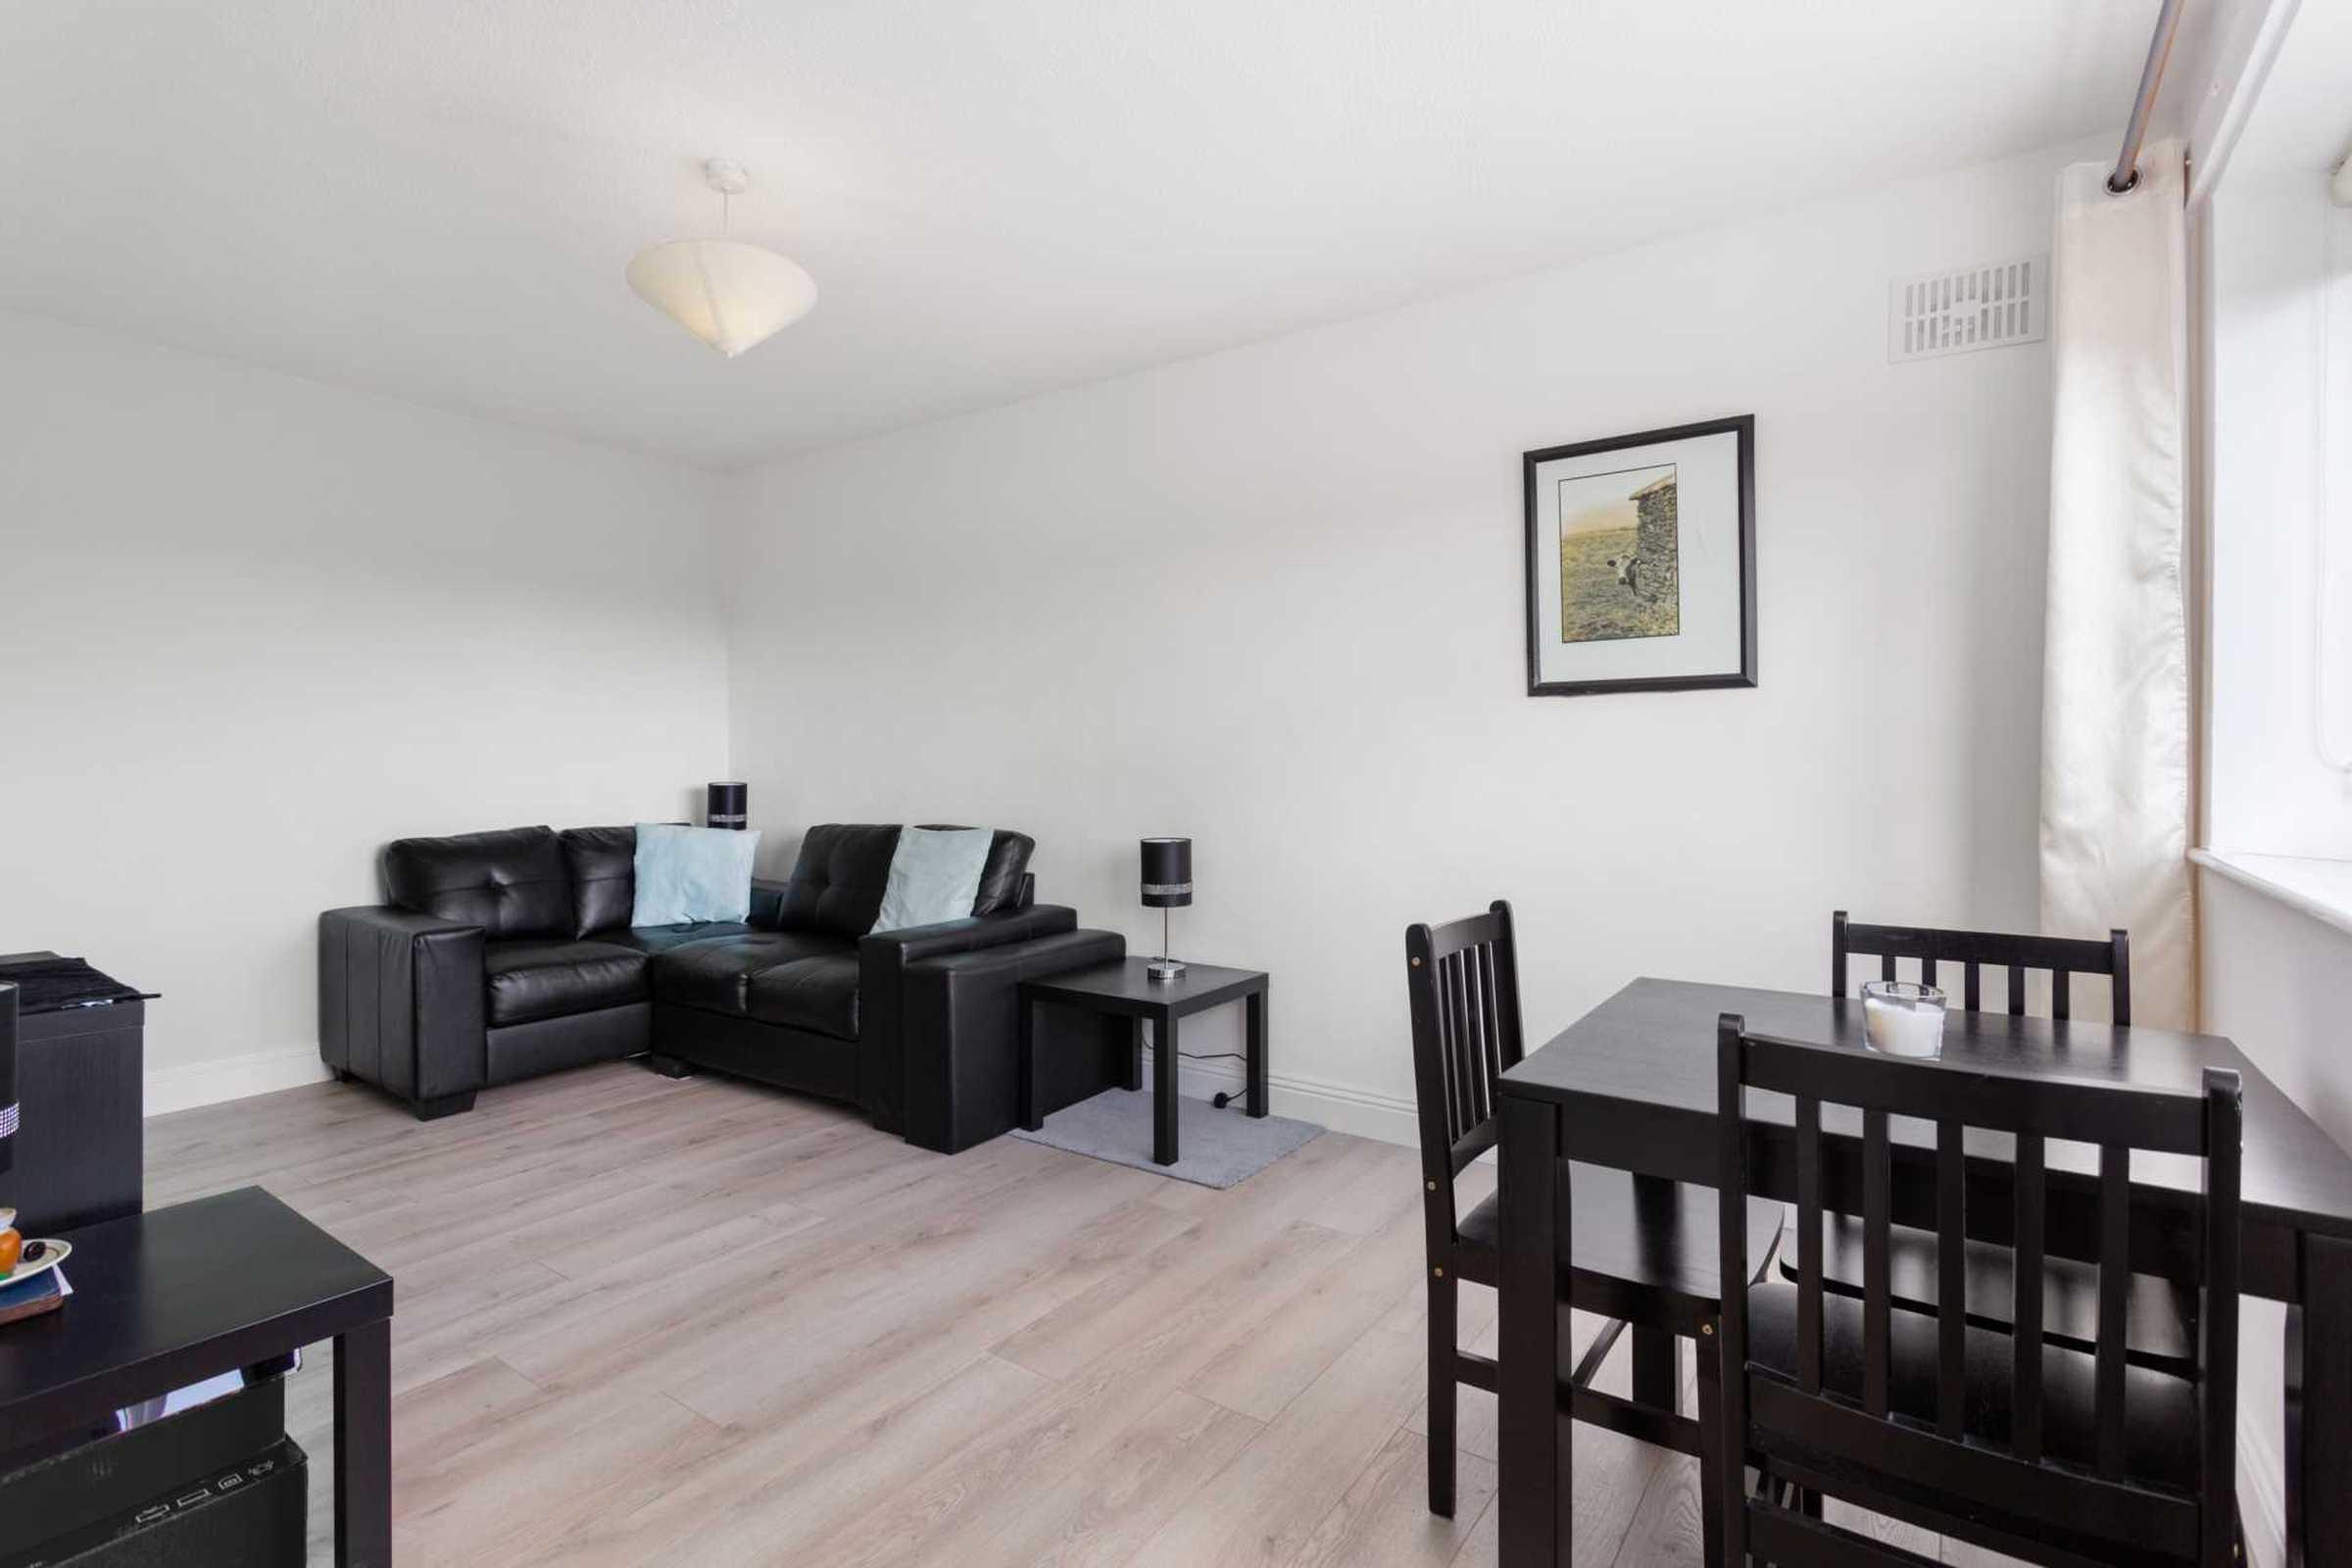 Apartment 12 Seafield Court Castle Avenue Clontarf, Clontarf, Dublin 3